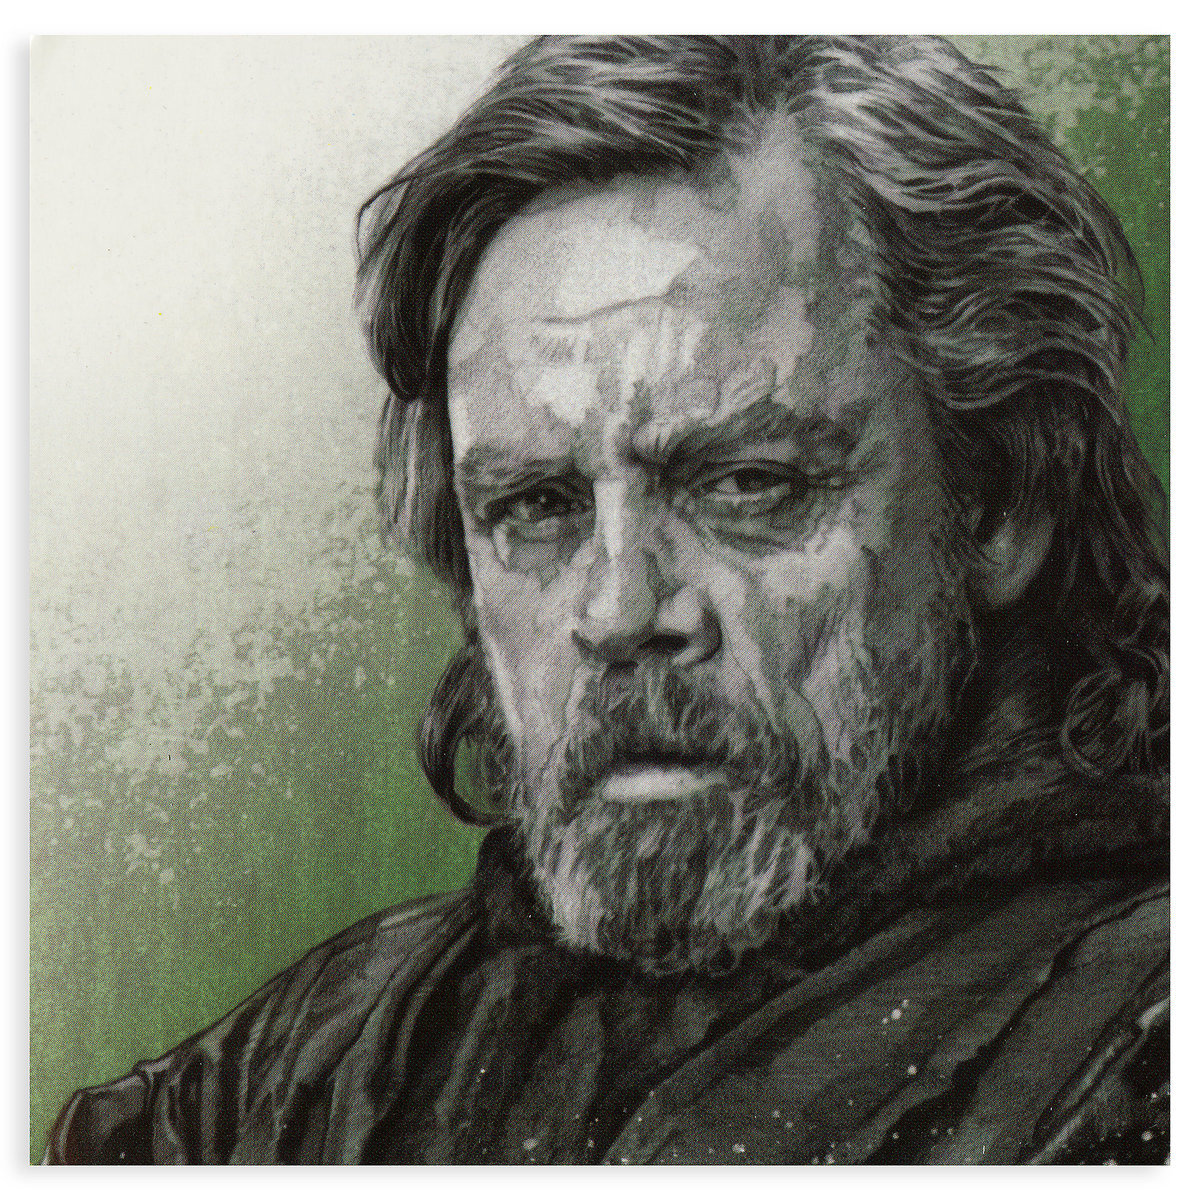 TLJ Luke Skywalker Pin & Lithograph Set 3